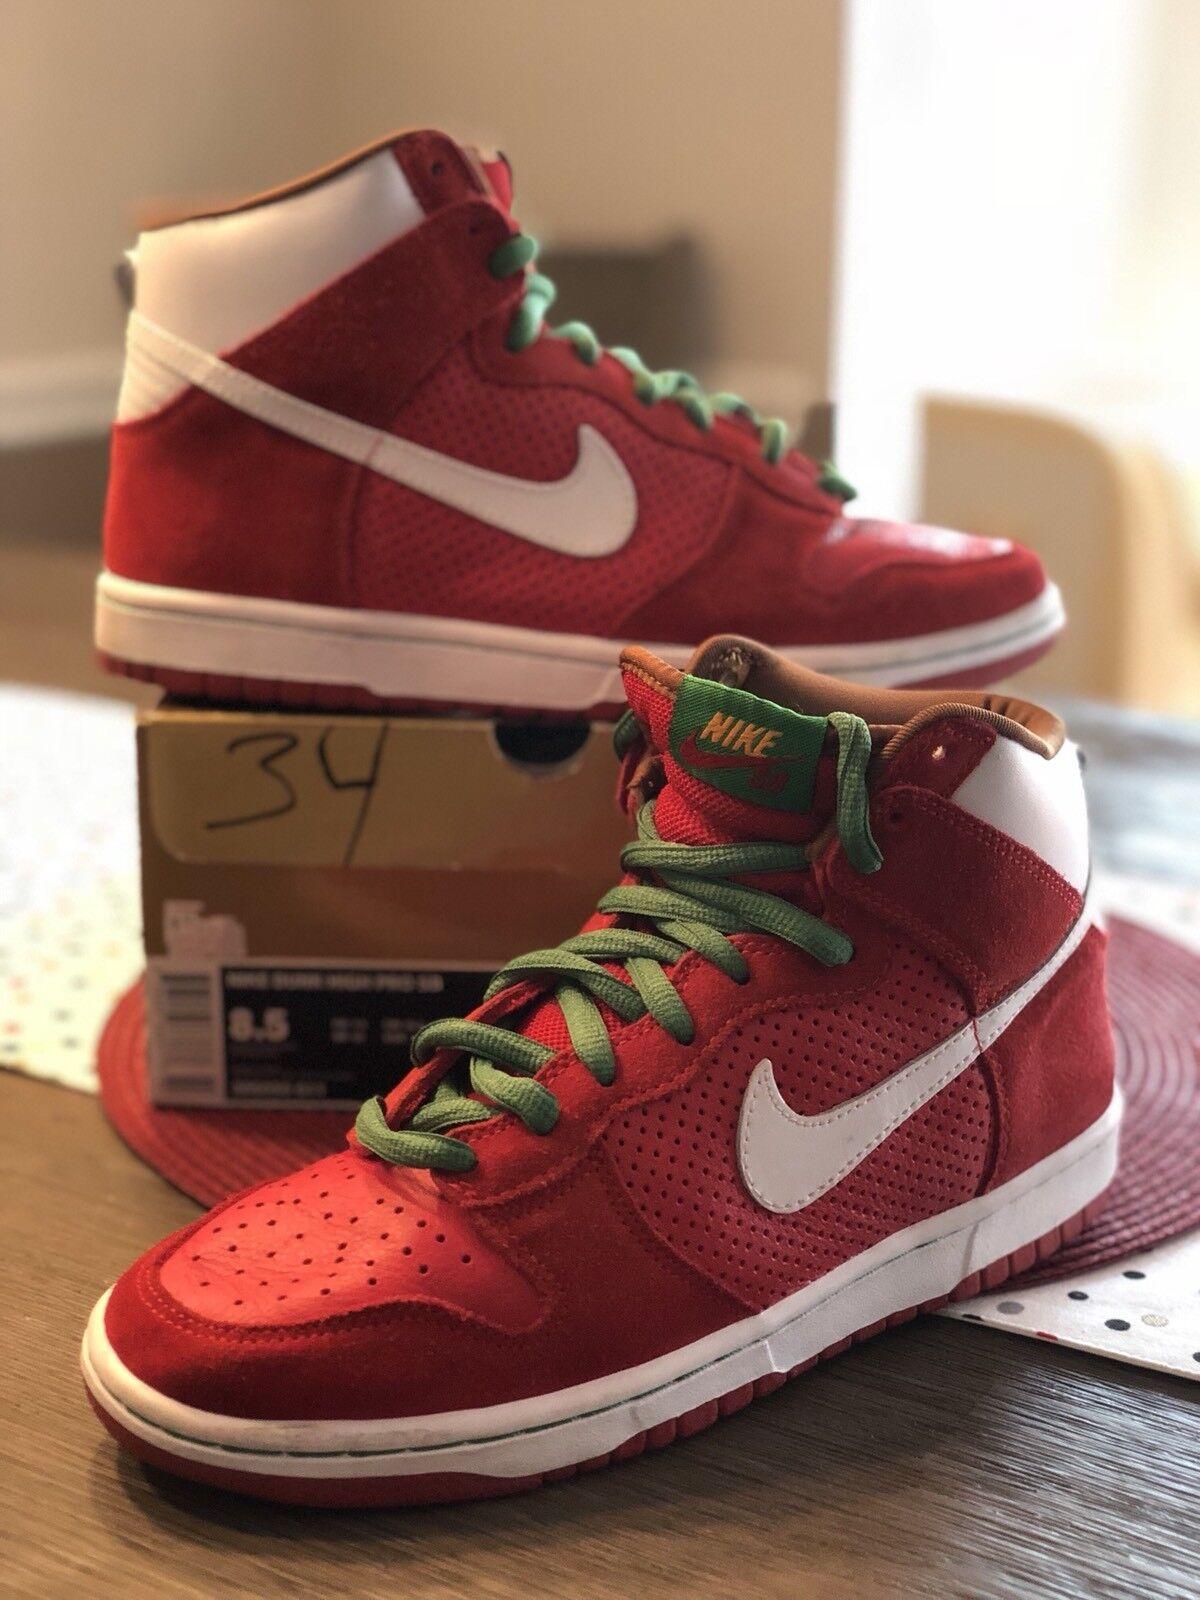 Nike Nike Nike Dunk High Pro SB Big Gulp Sport rosso bianca 305050-611 - Dimensione 8.5 3fa4f0